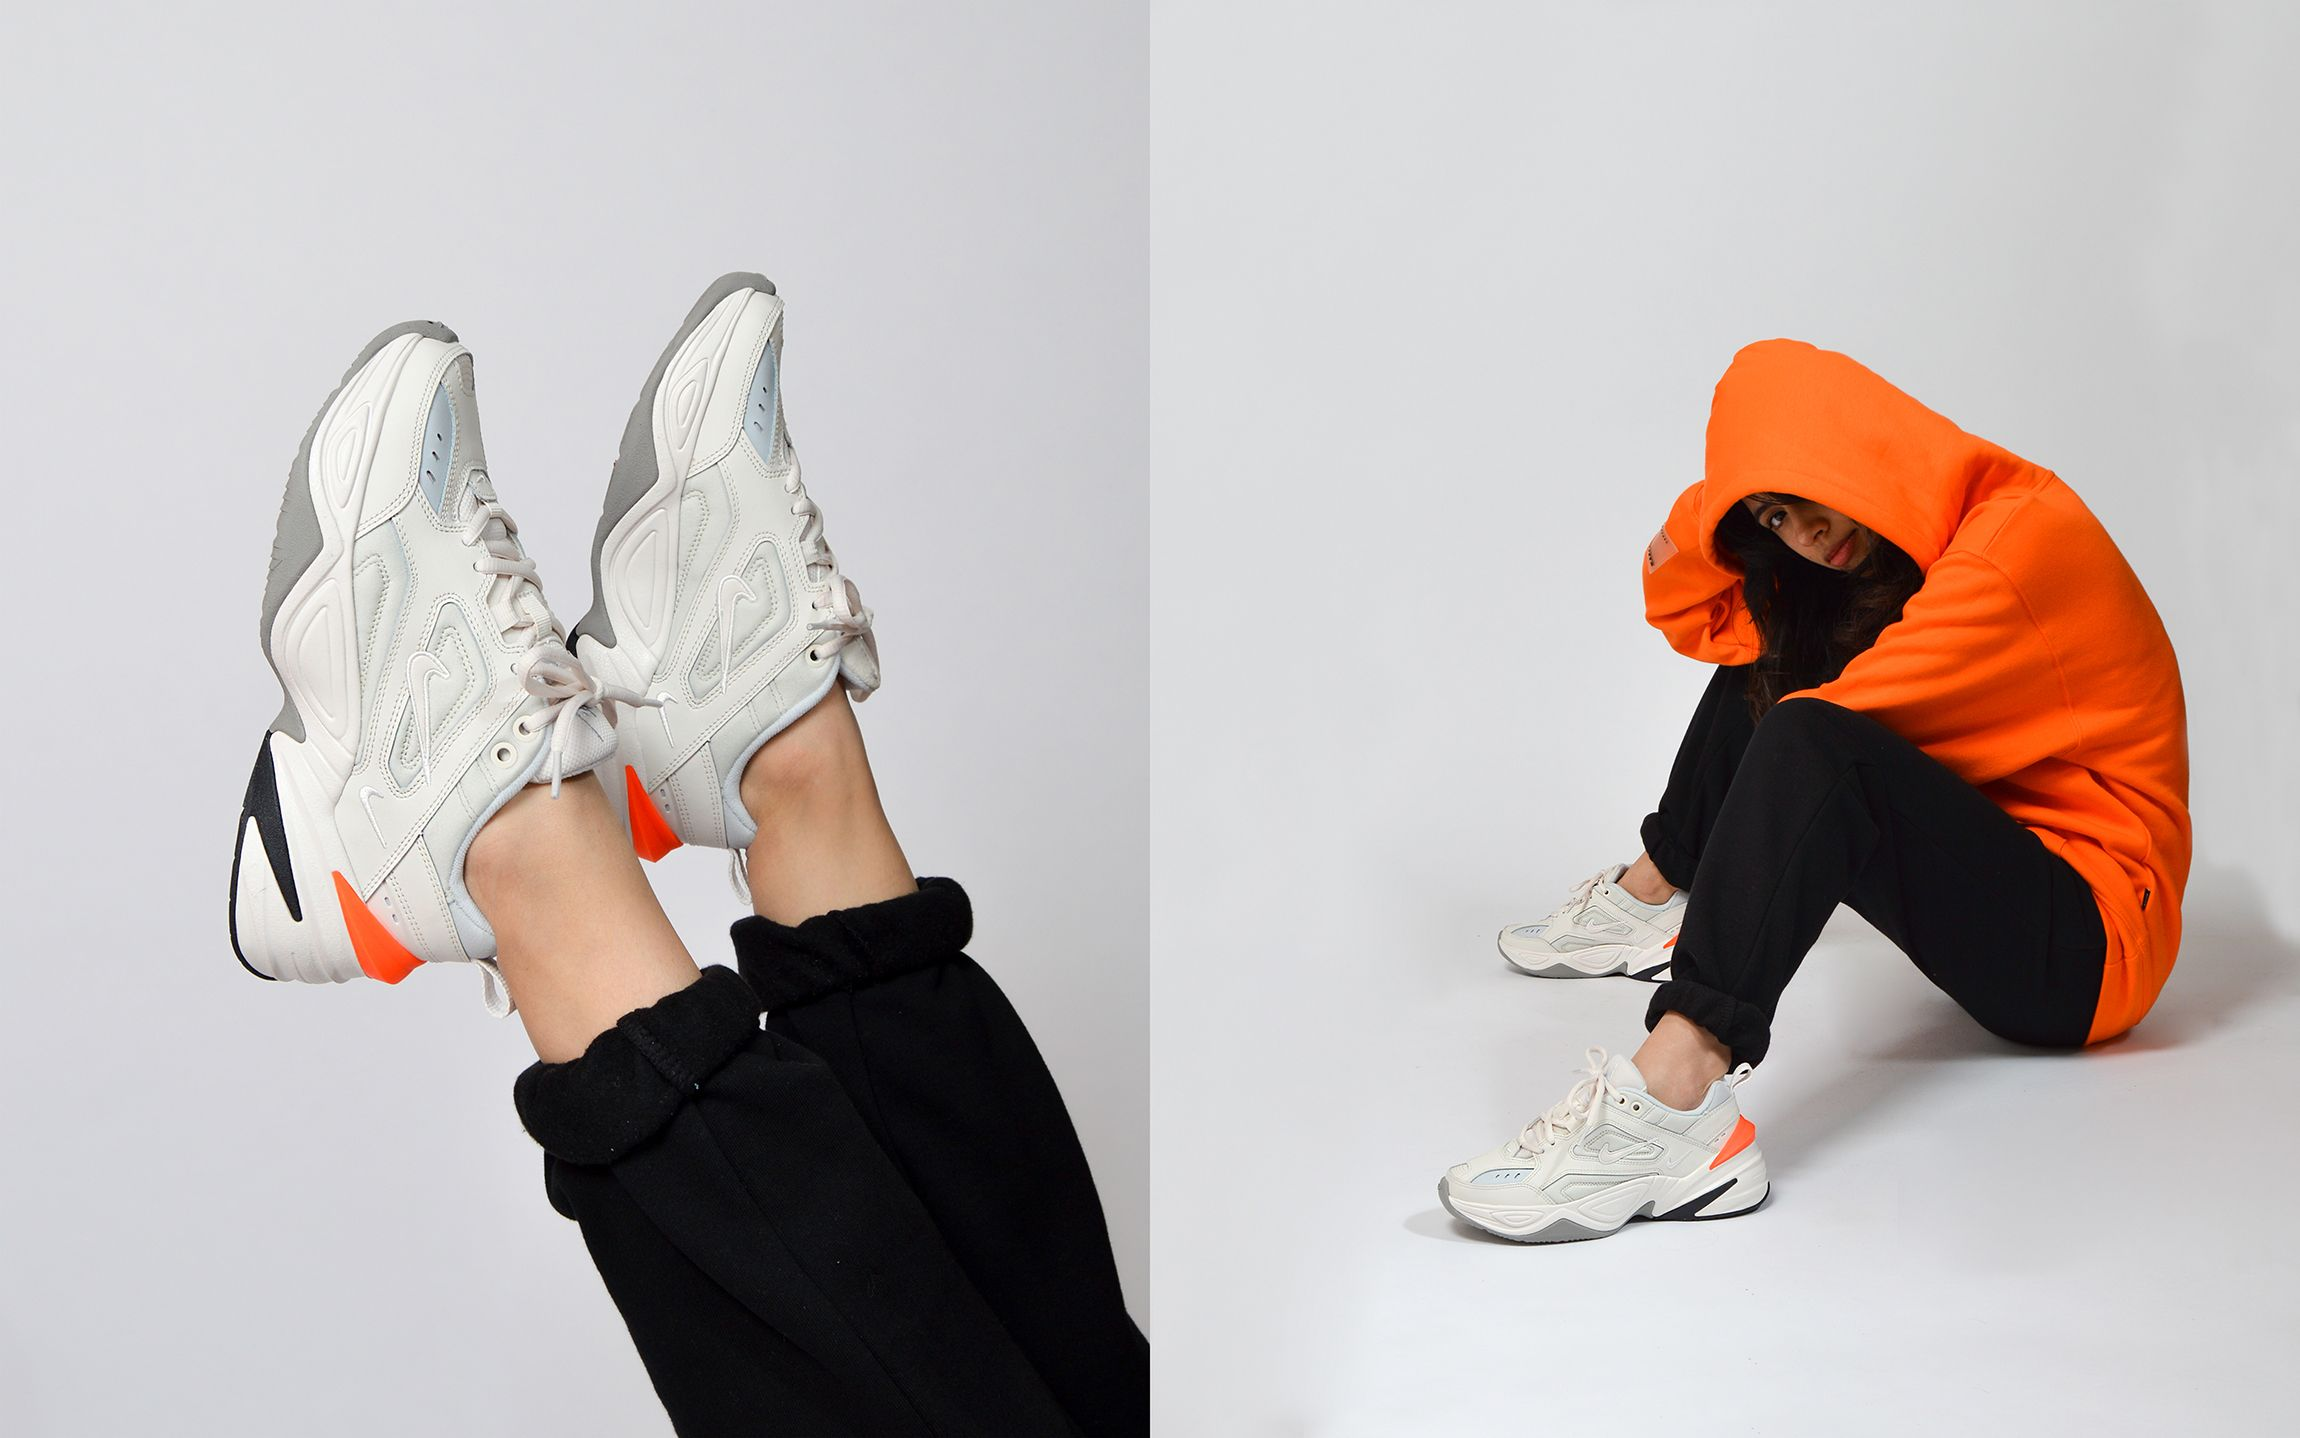 official photos 10e65 256bc Maha Amsterdam presents M2K TEKNO from Nike Sportswear. Shot by Dian  Iskandar.